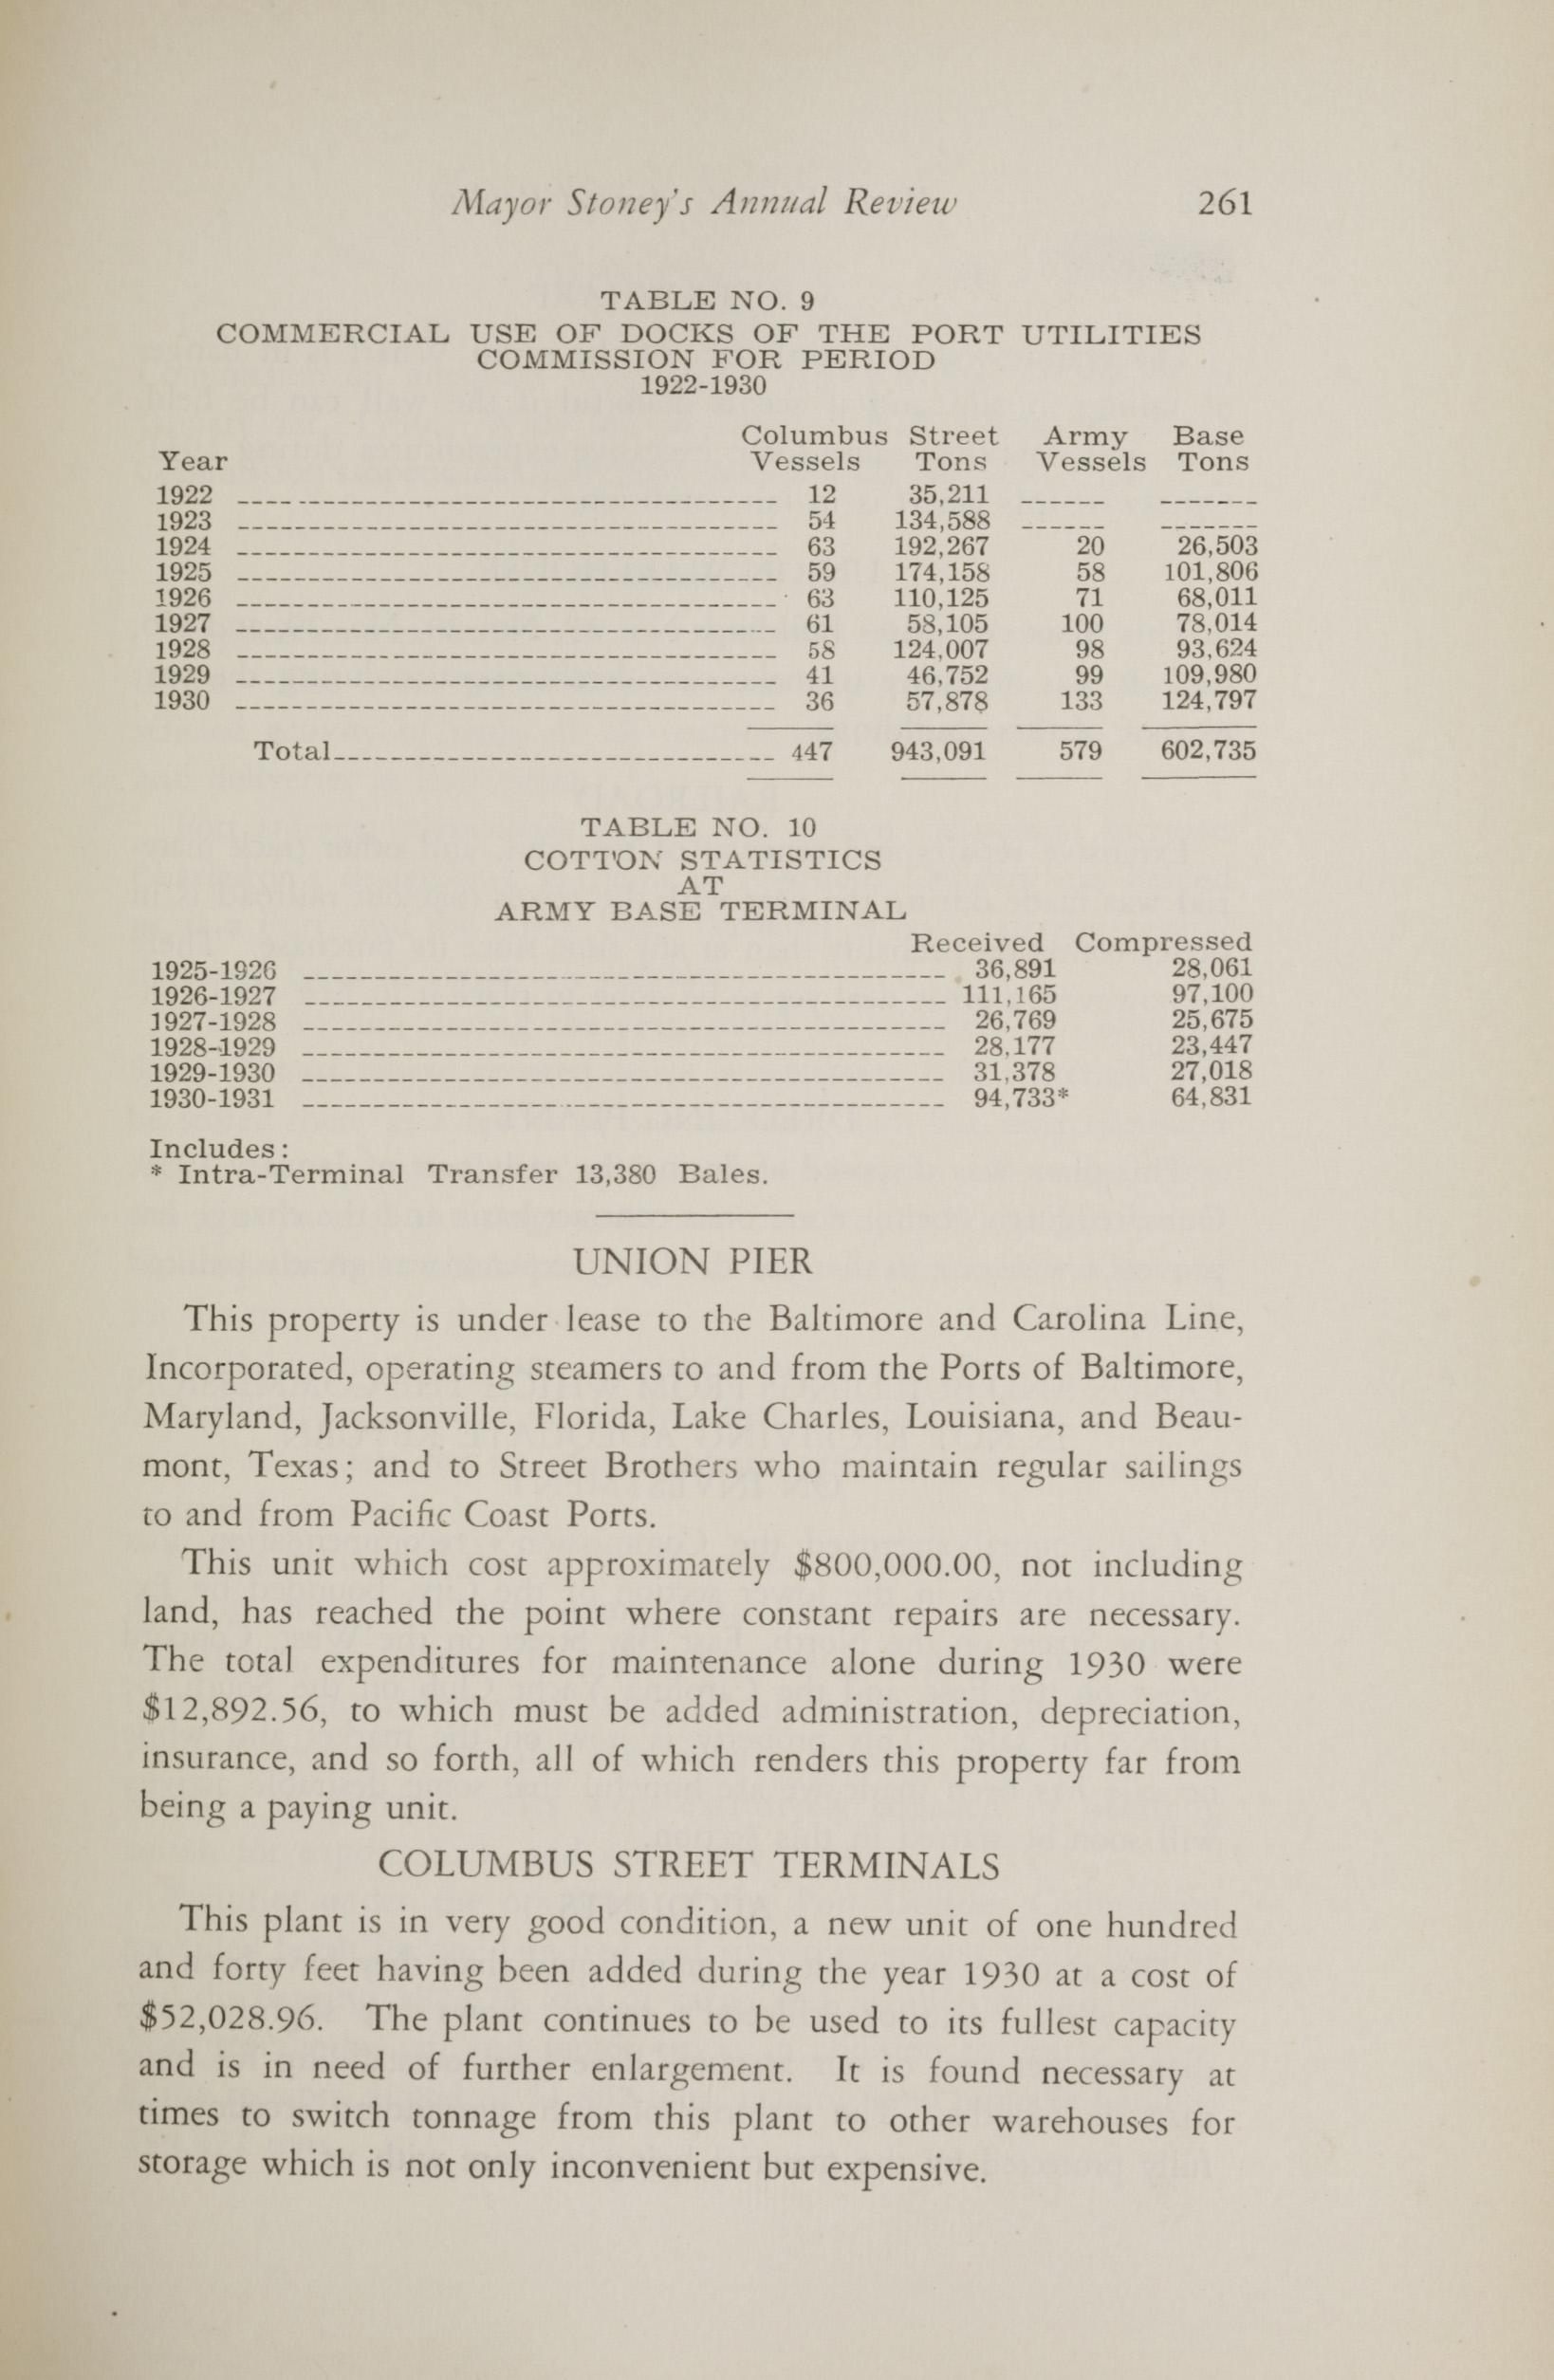 Charleston Yearbook, 1930, page 261